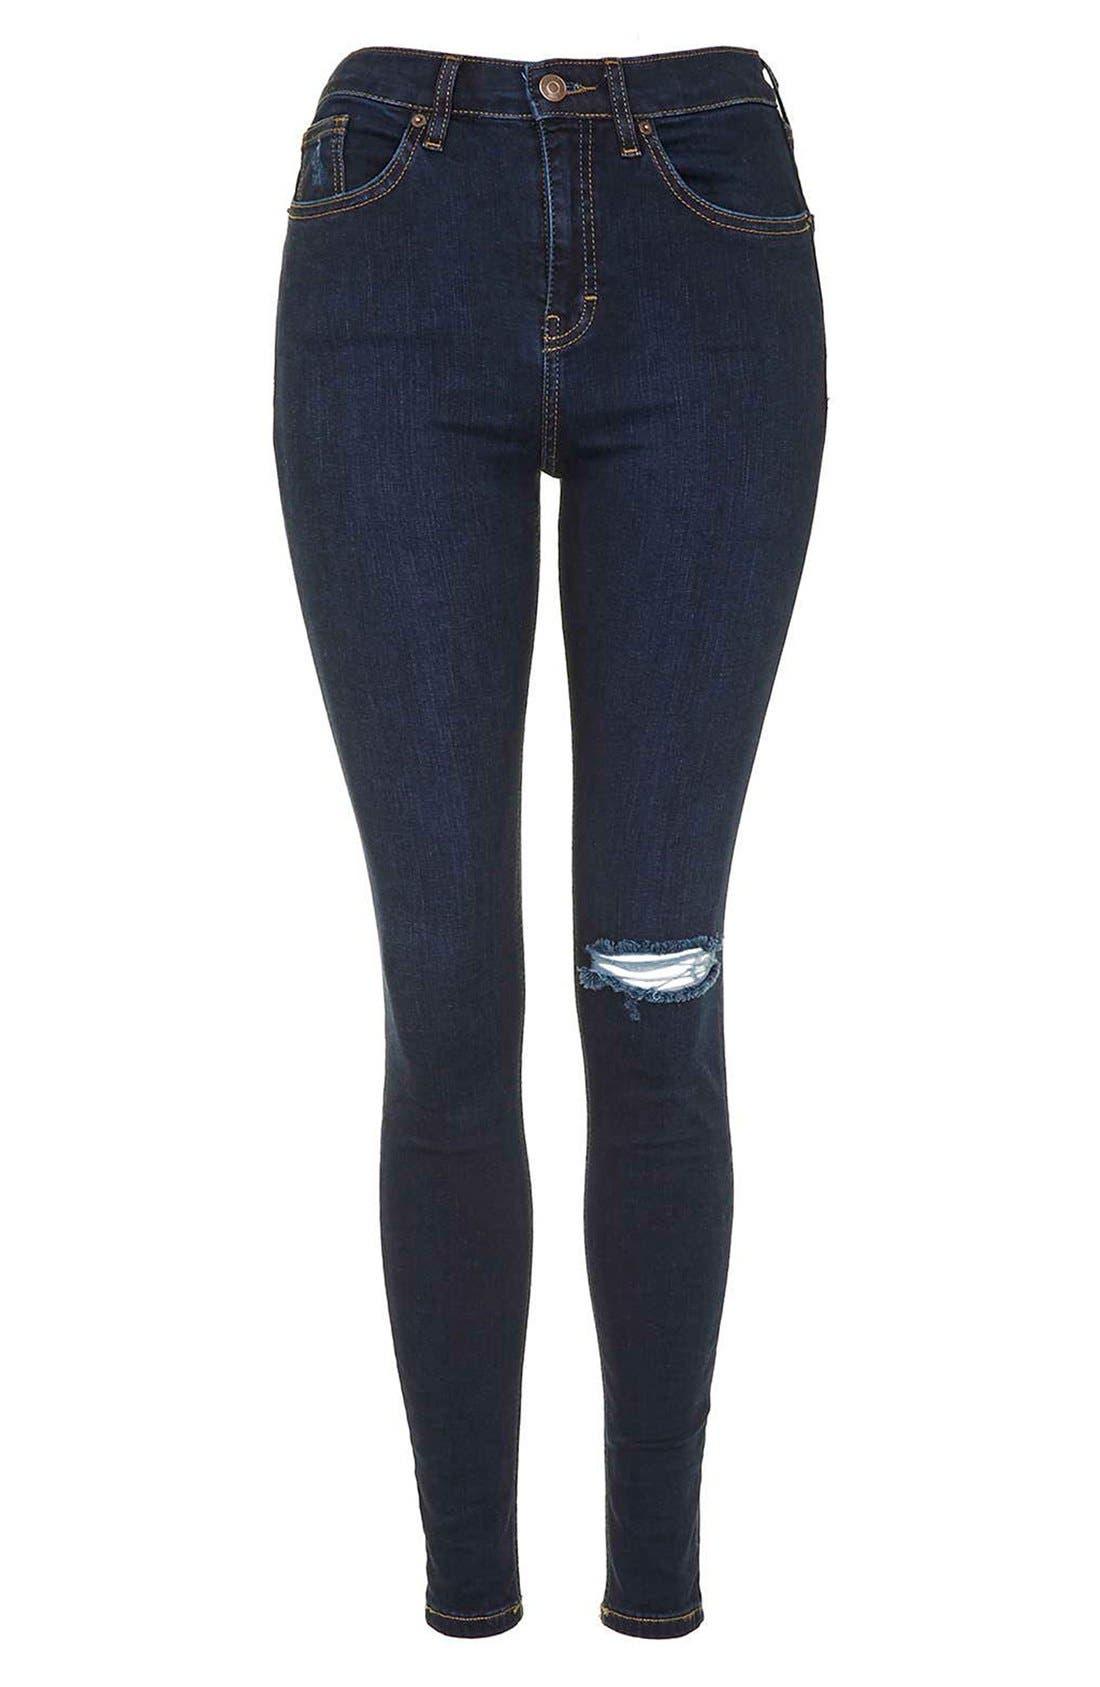 Alternate Image 4  - Topshop Moto 'Jamie' Ripped Skinny Jeans (Navy Blue)